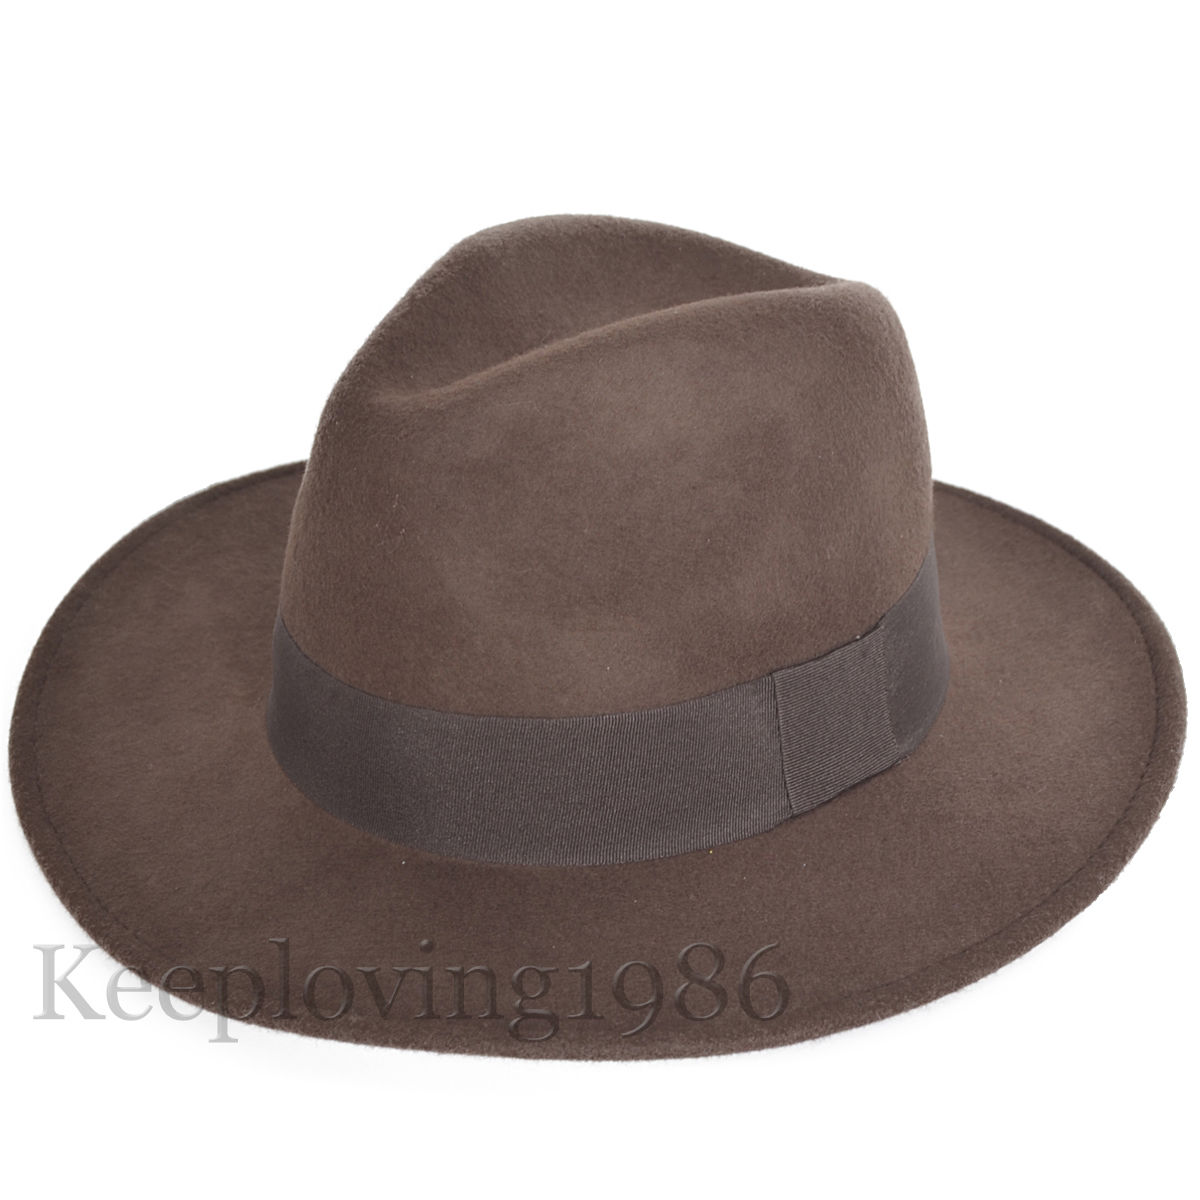 005839184b952 Black Fedoras  Amazon.com Fedora Dress Hats  Men s Wool Panama Fedora Hat  Dress Wedding Fedora Derby